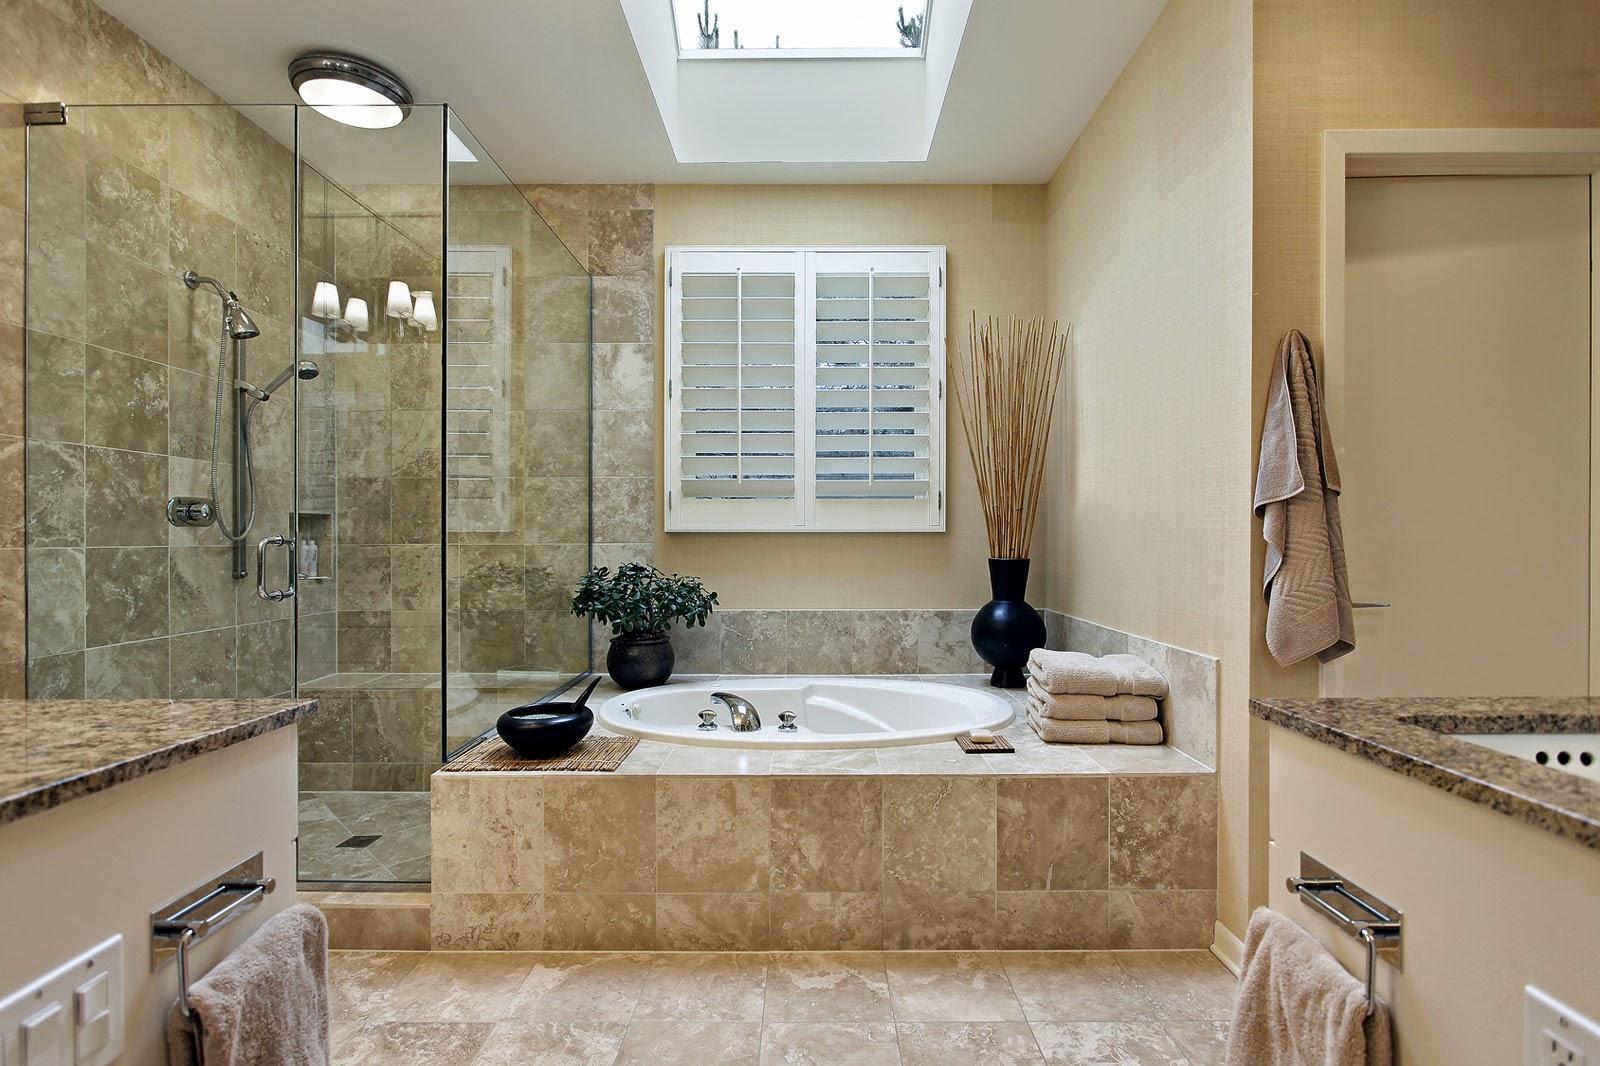 The idea-design-bath-room-to-room-Minimalist-Bathroom-Modern